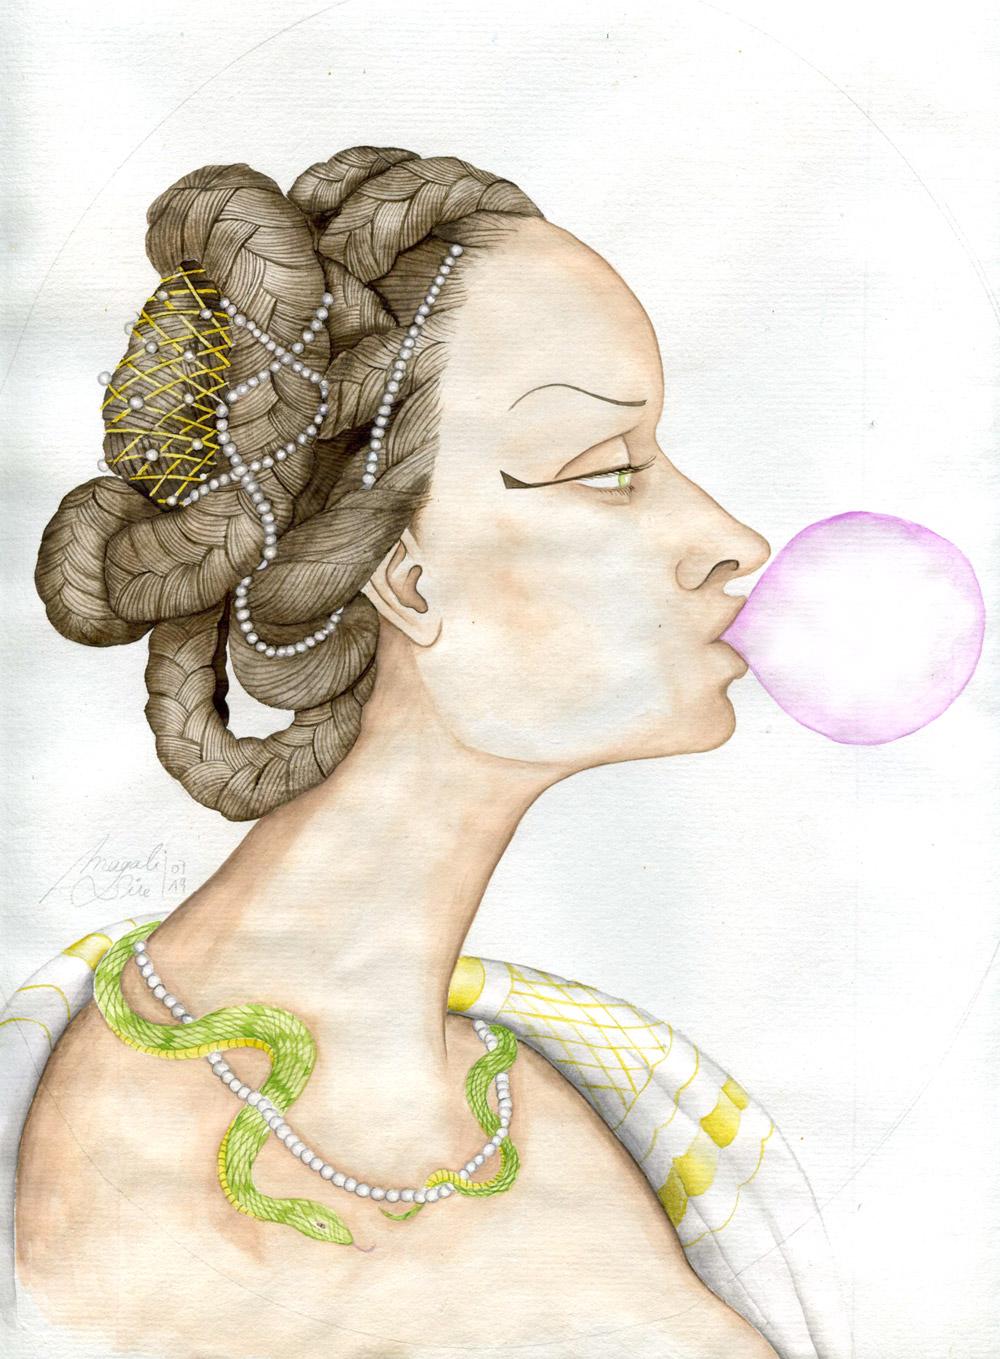 Cléopâtre et son malabar | 29 x 23 cm